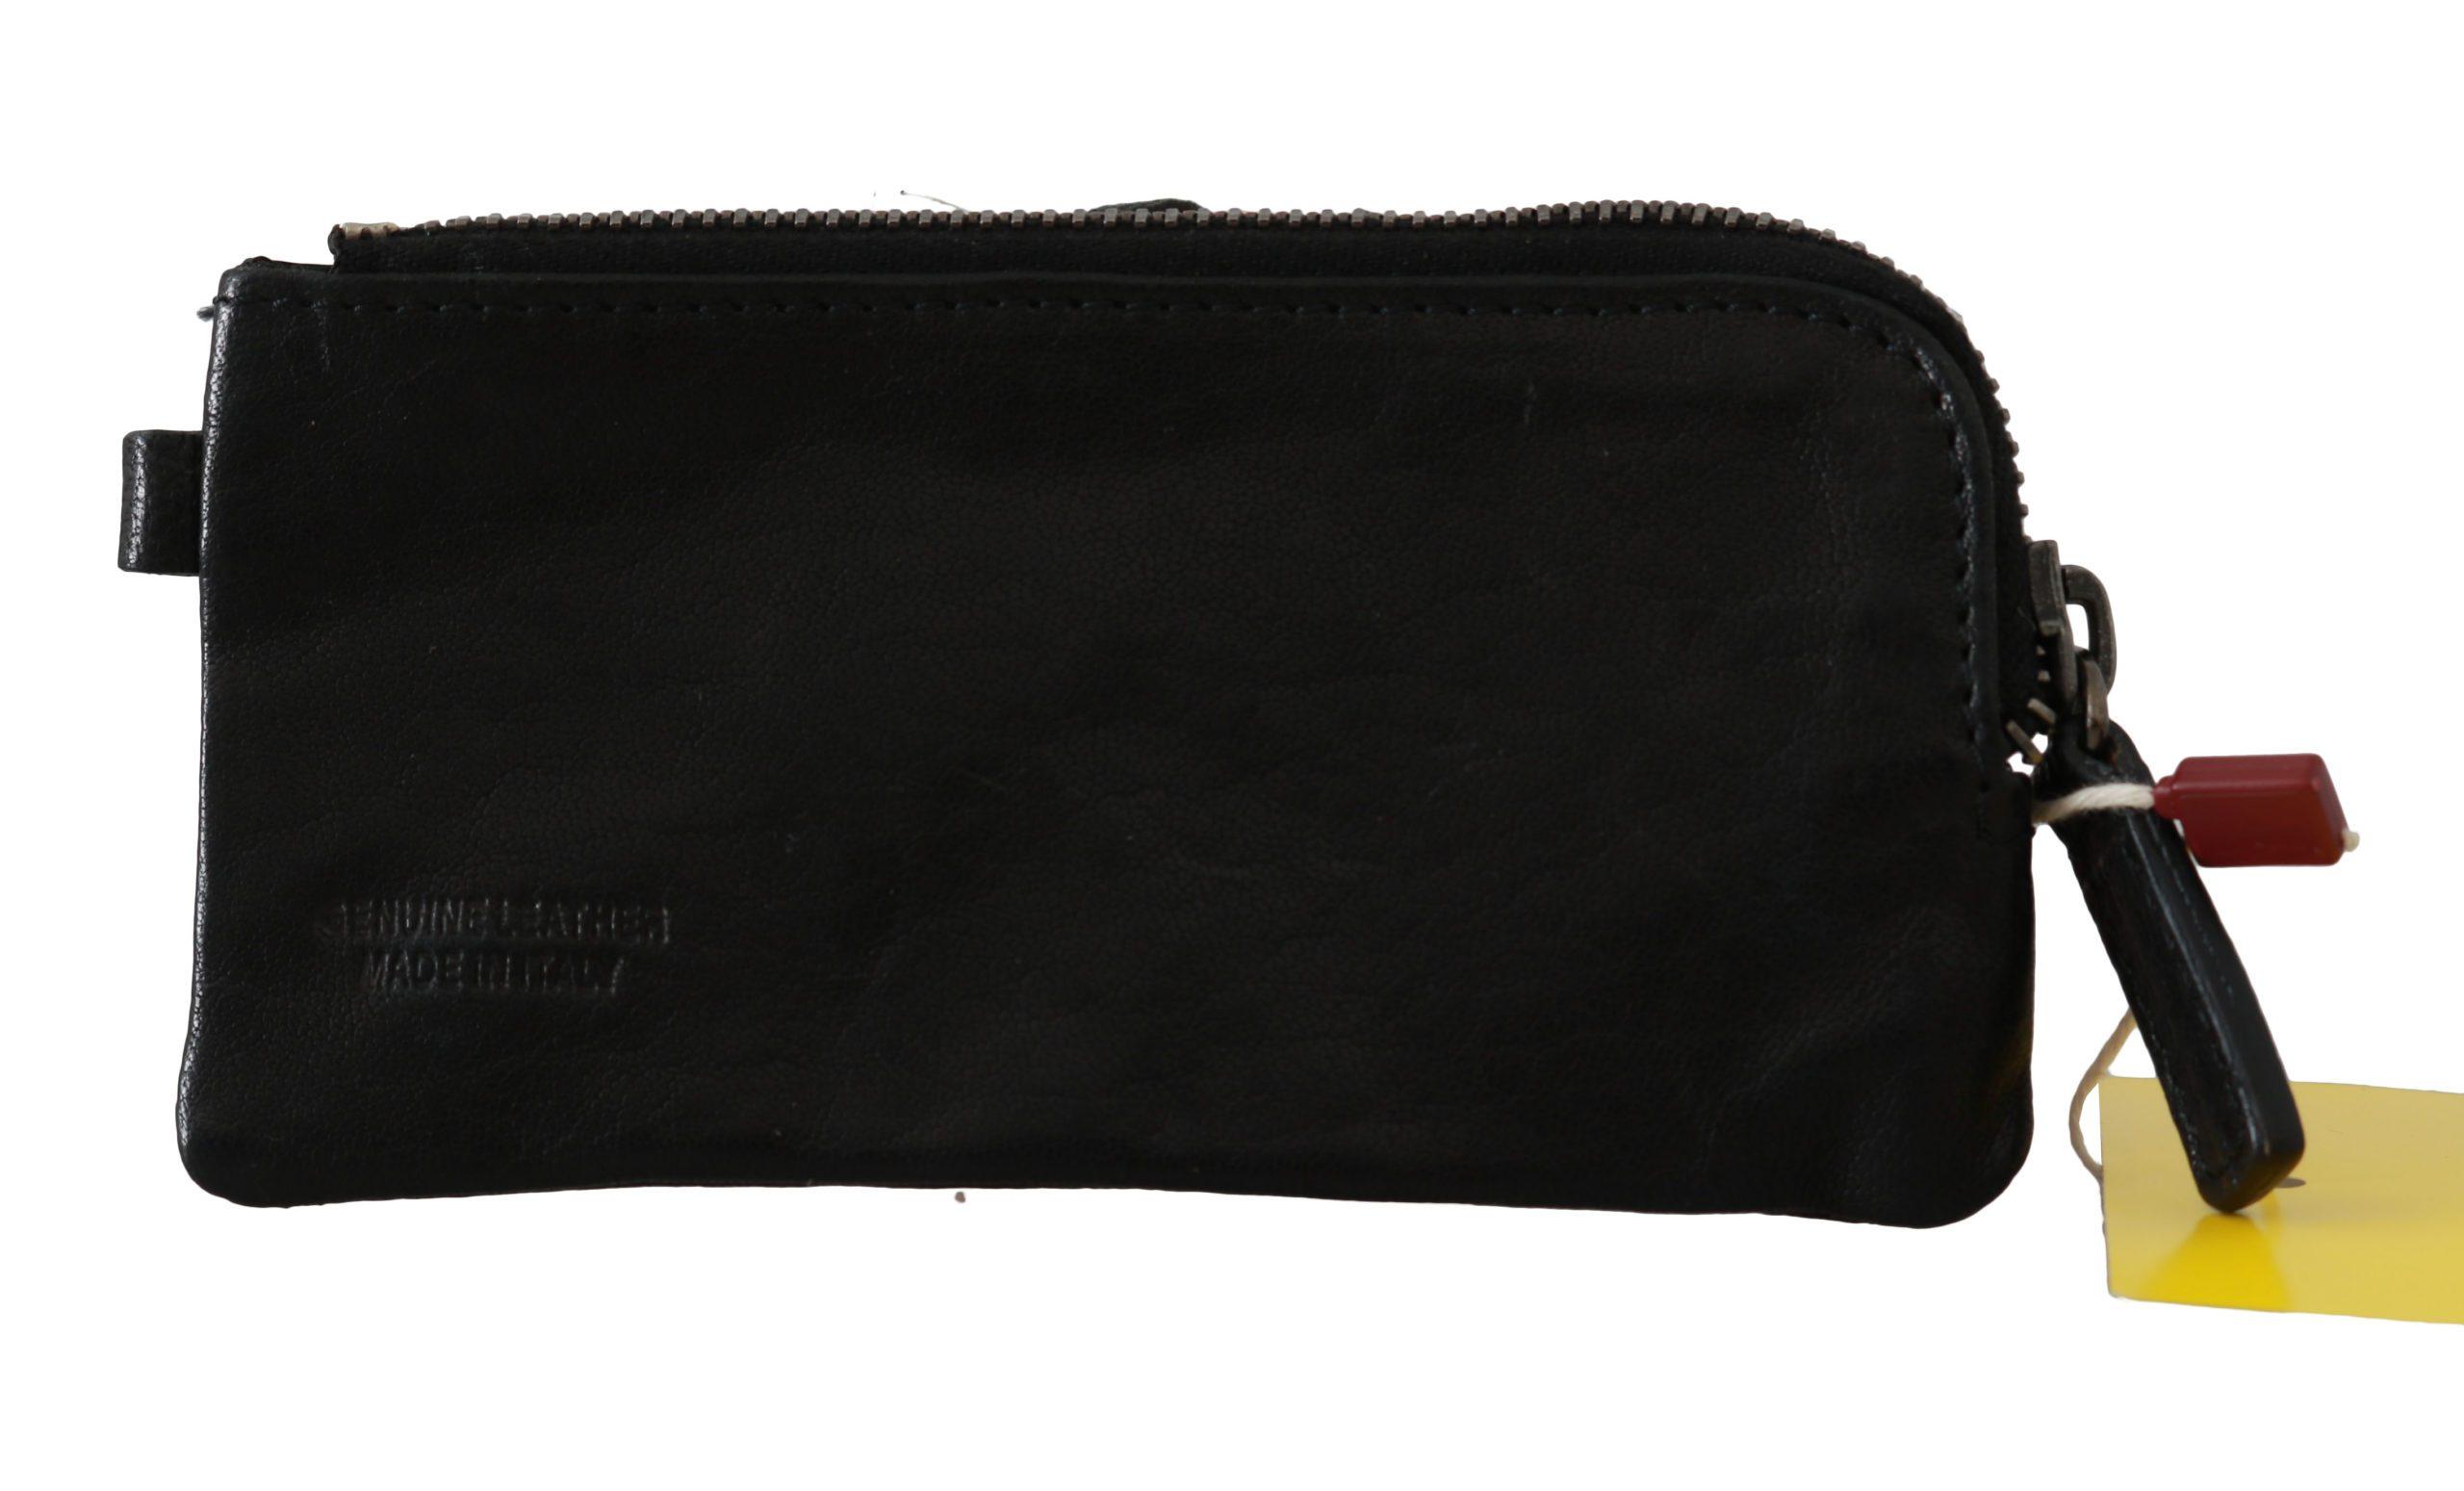 John Galliano Women's Genuine Leather Wallet Black VAS8839